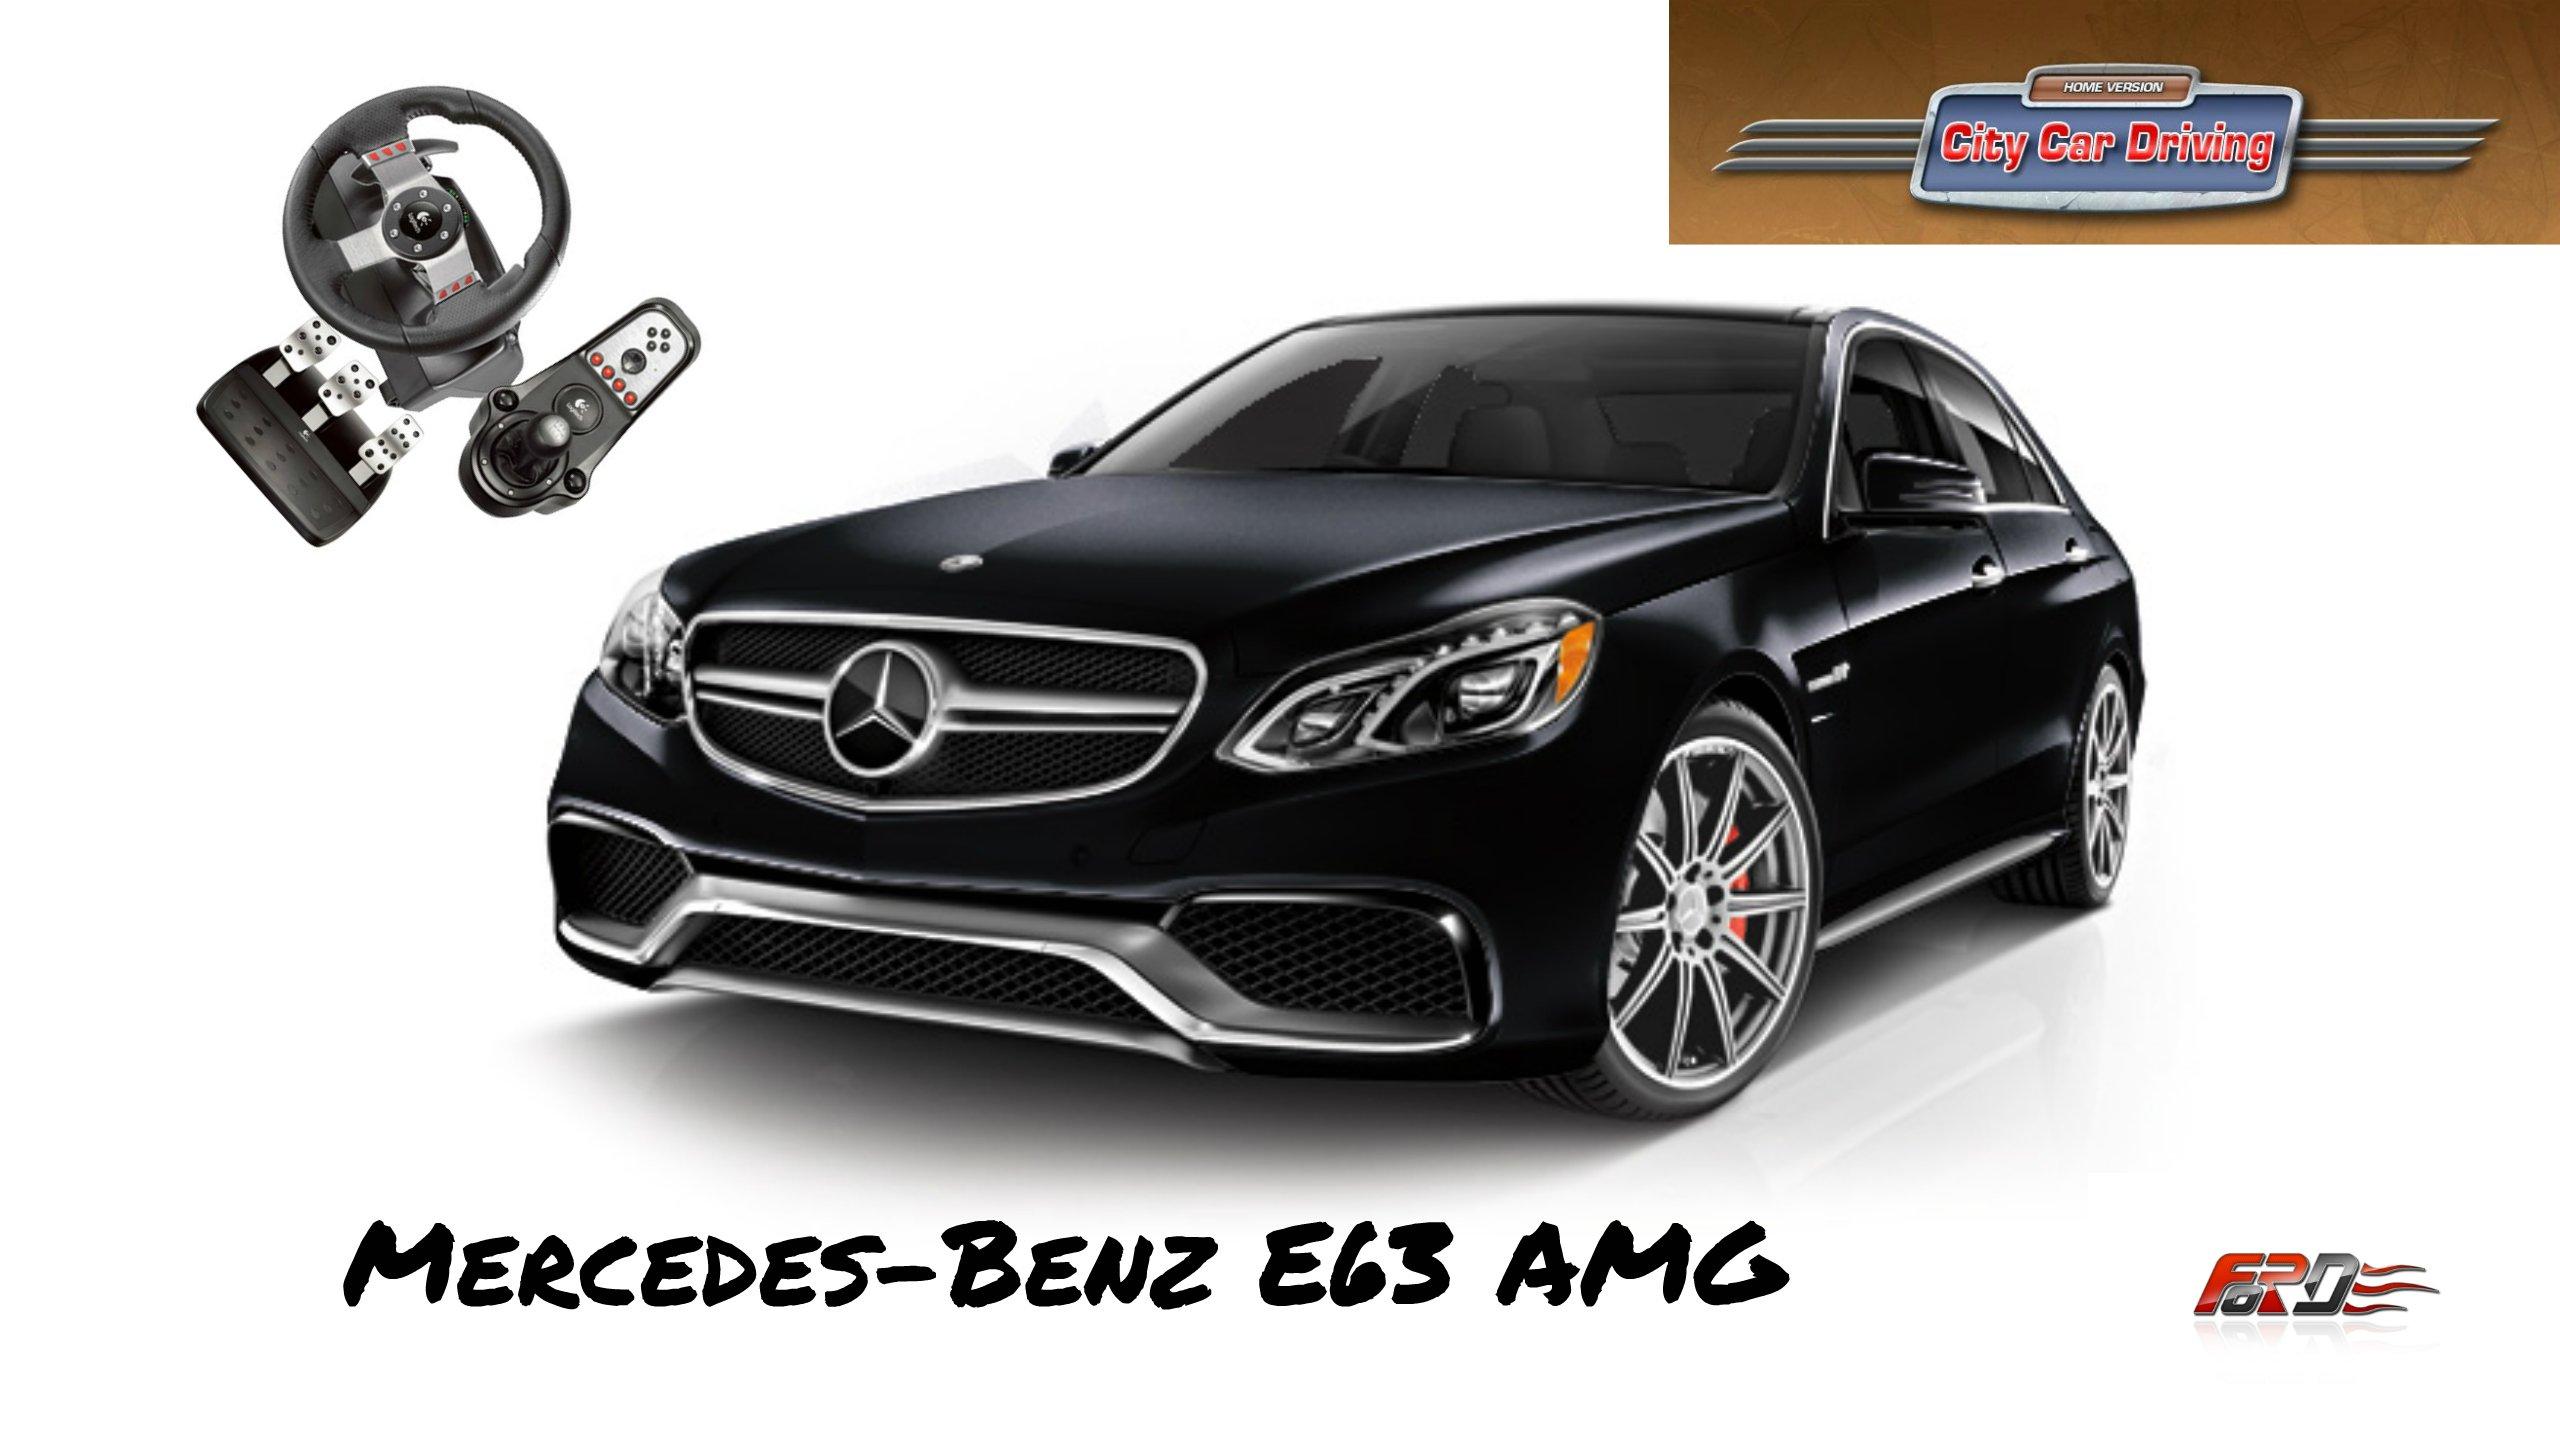 Mercedes-Benz E 63 AMG W212 - тест-драйв, обзор, полицейский с Рублевки в City Car Driving. - Изображение 1